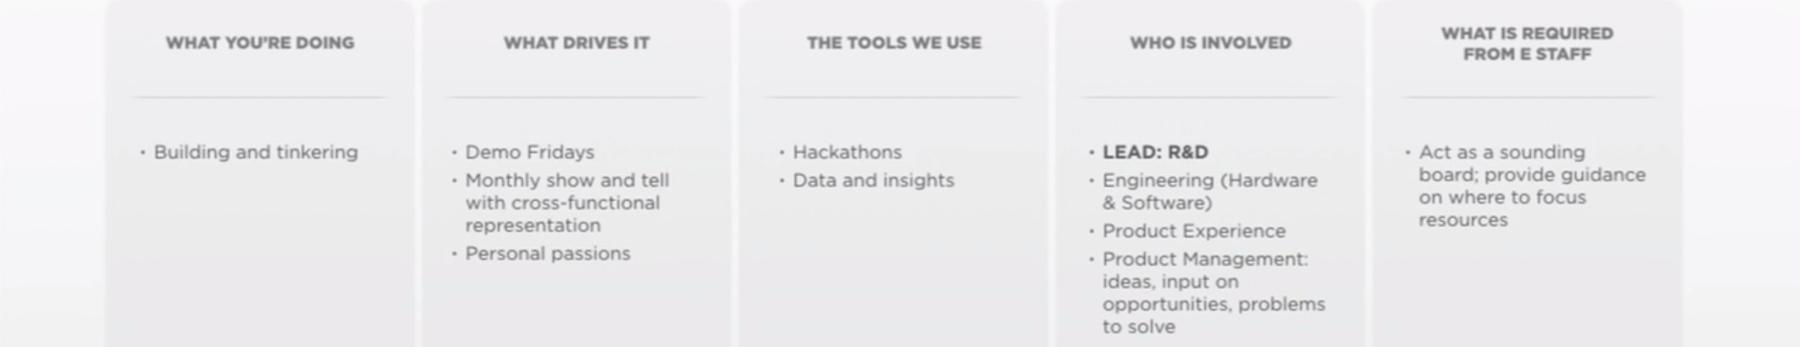 Хосейн Рахман: Как в Jawbone проектируют hardware-продукты - 12